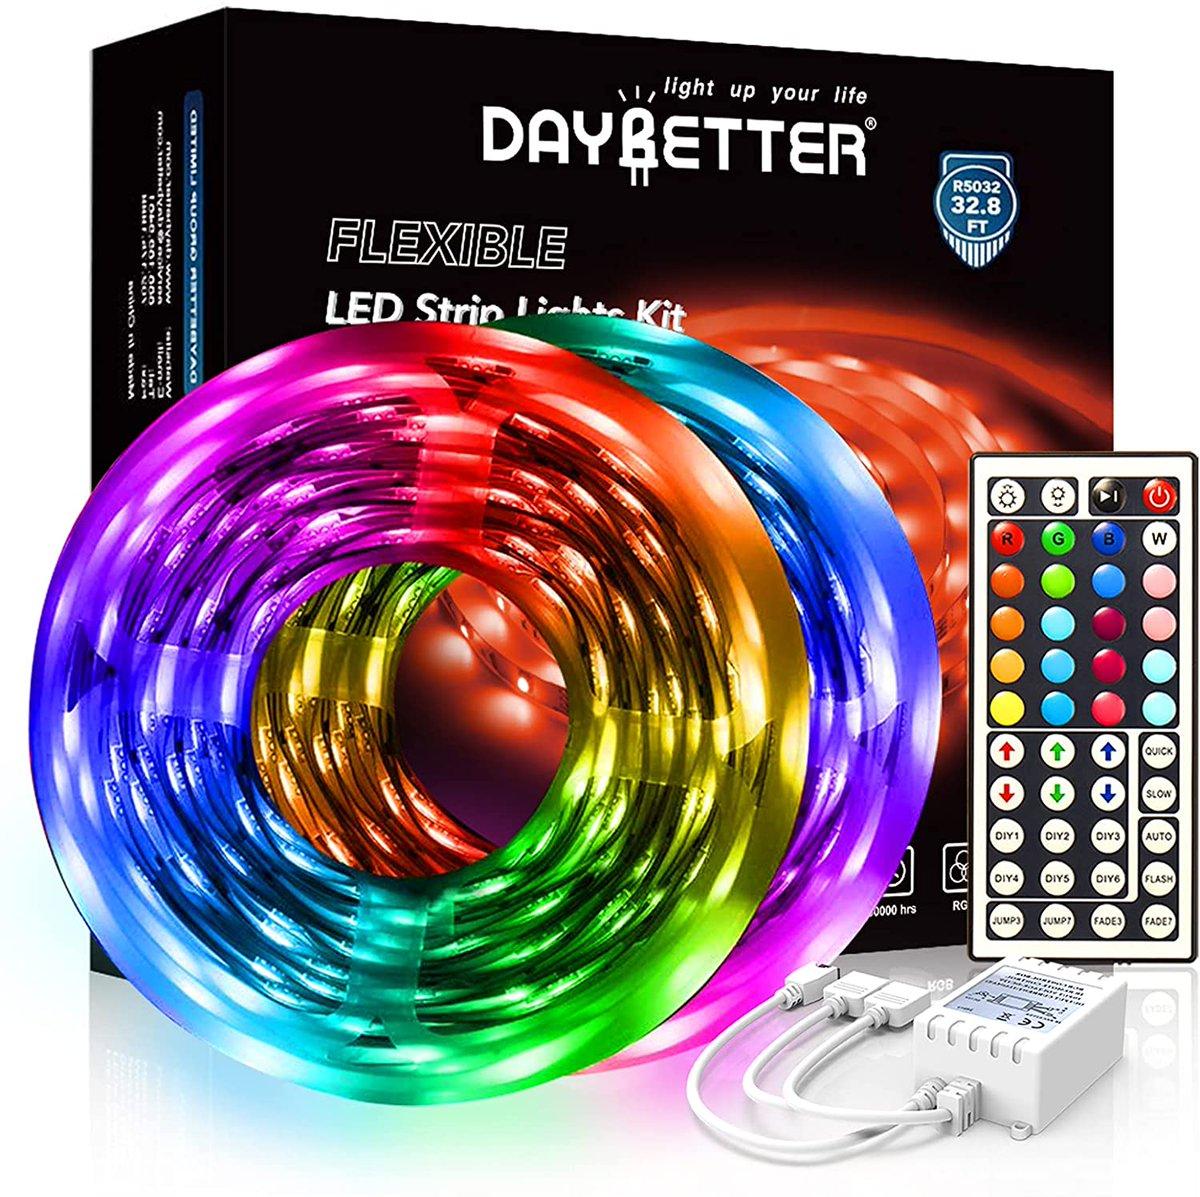 DAYBETTER Led Strip Lights  Only $14.44!